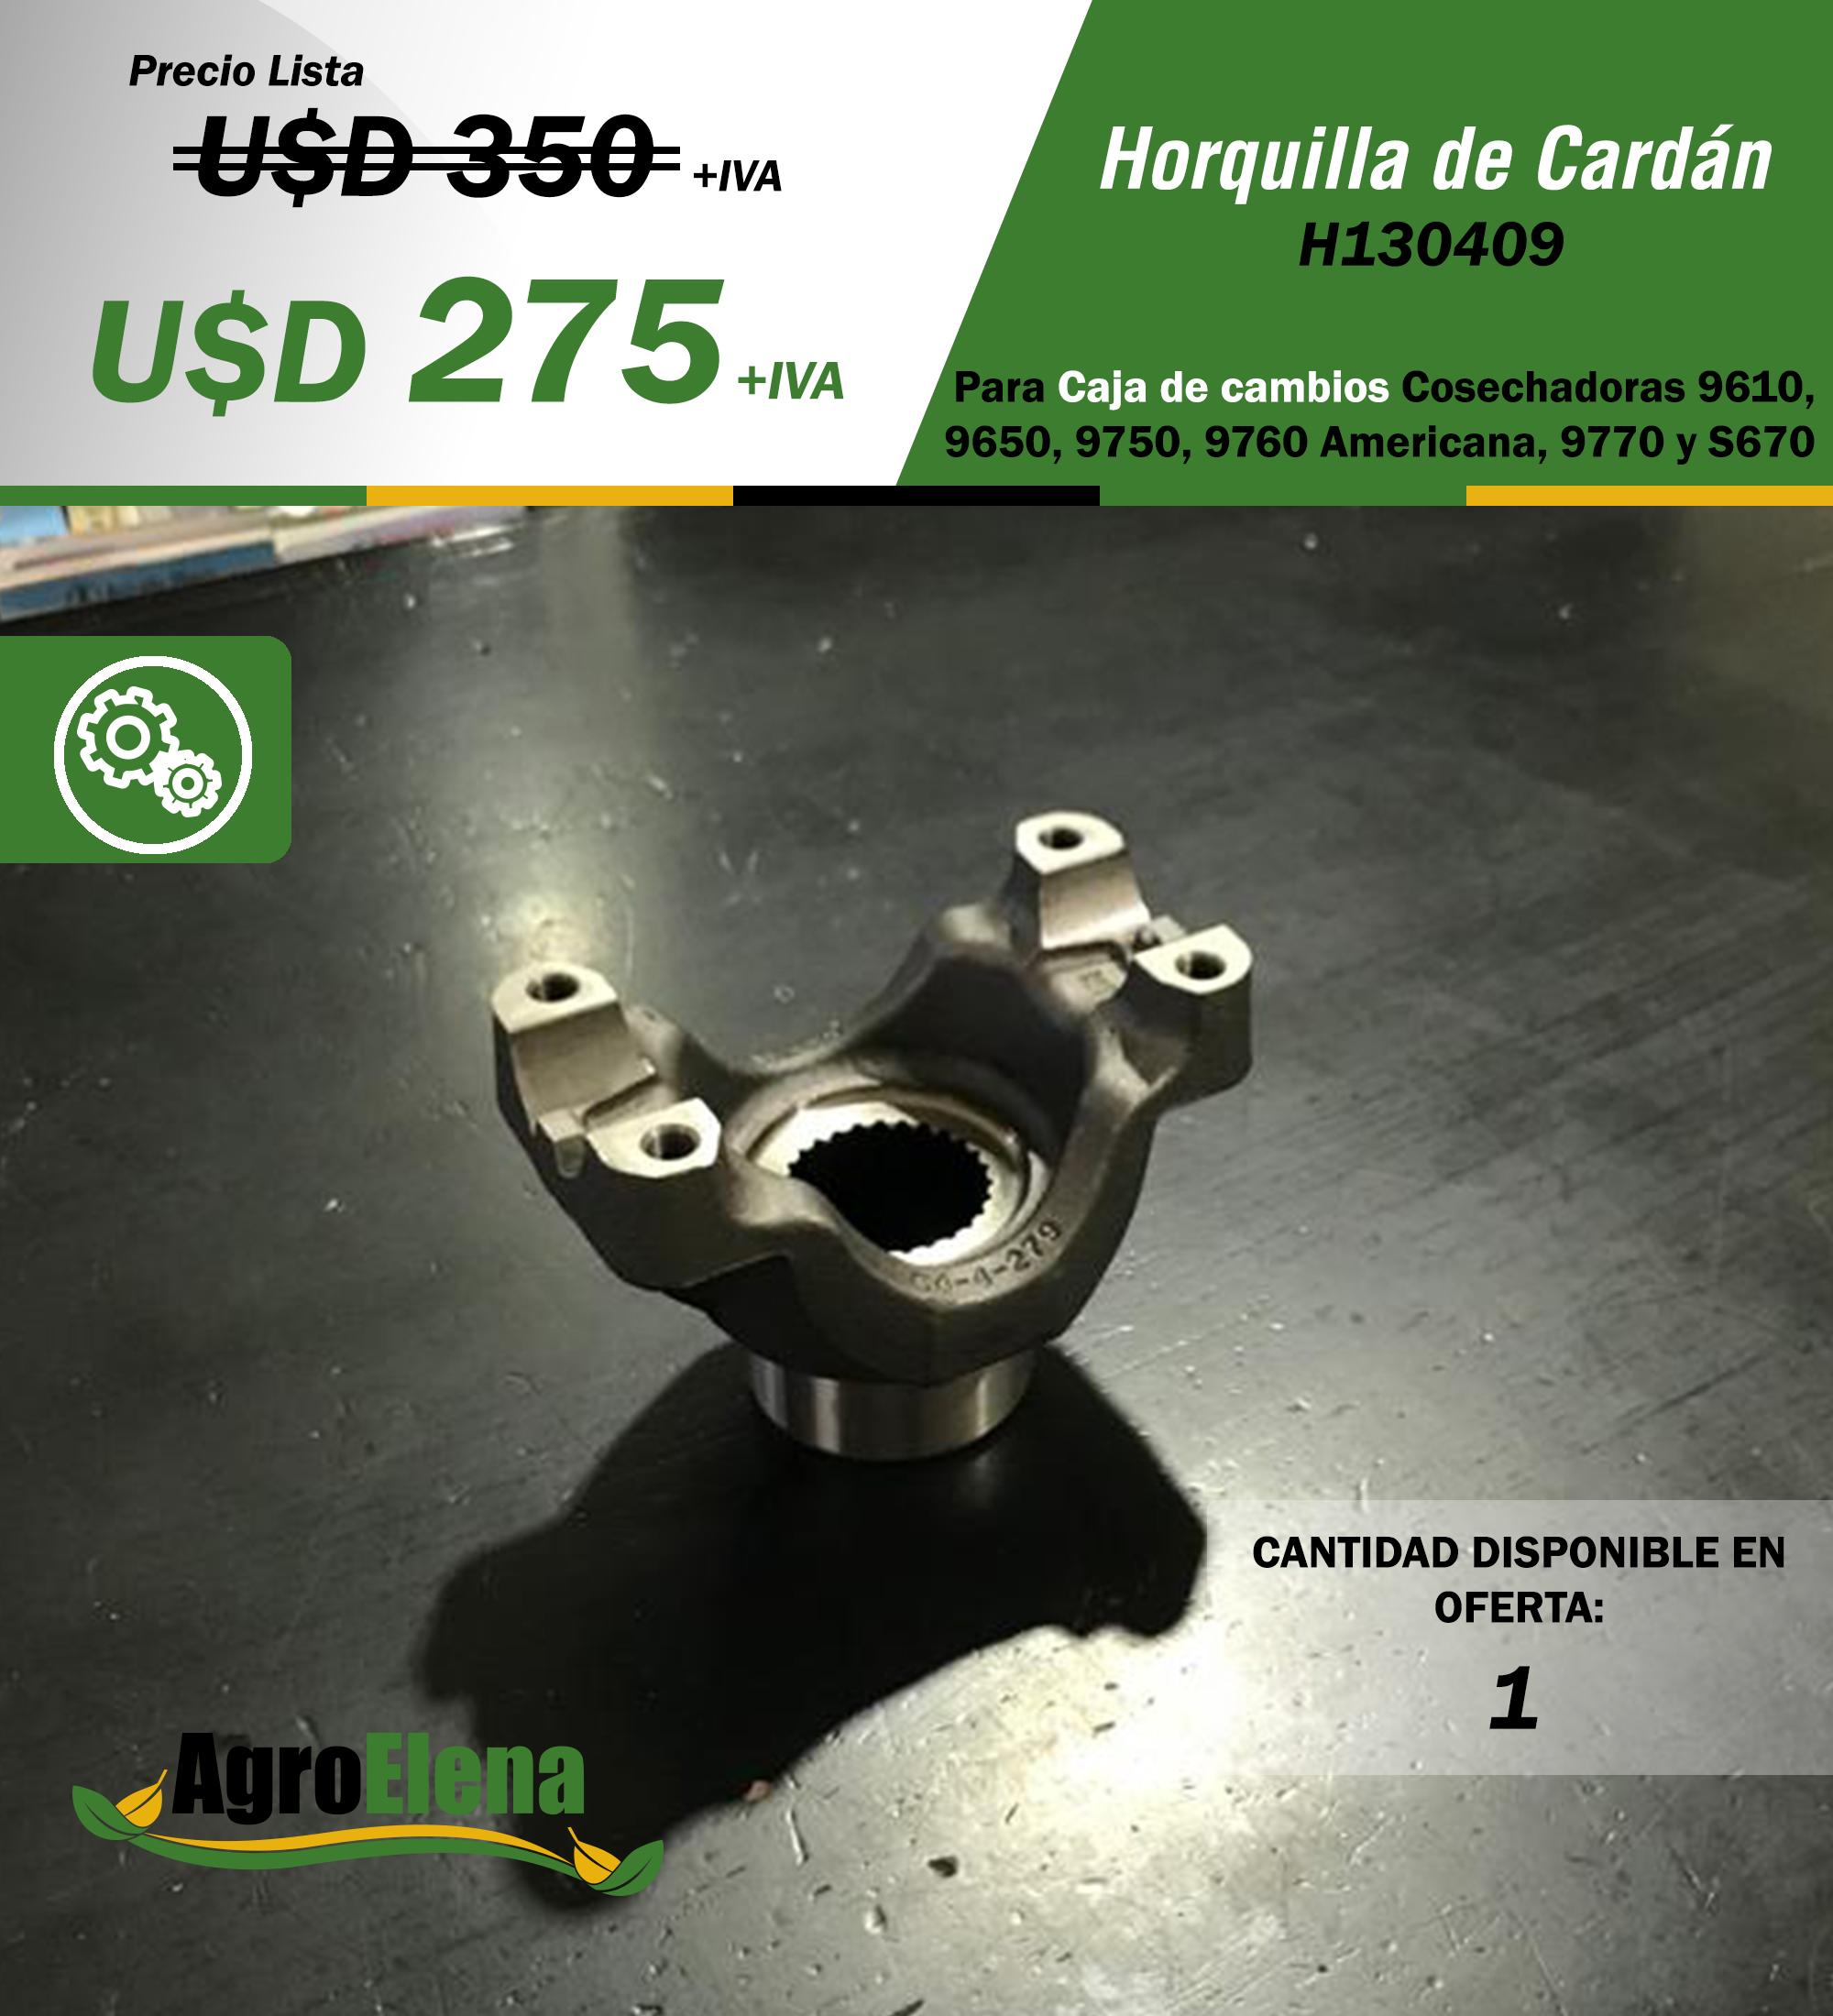 HORQUILLA CAJA DE CAMBIOS JOHN DEERE Image